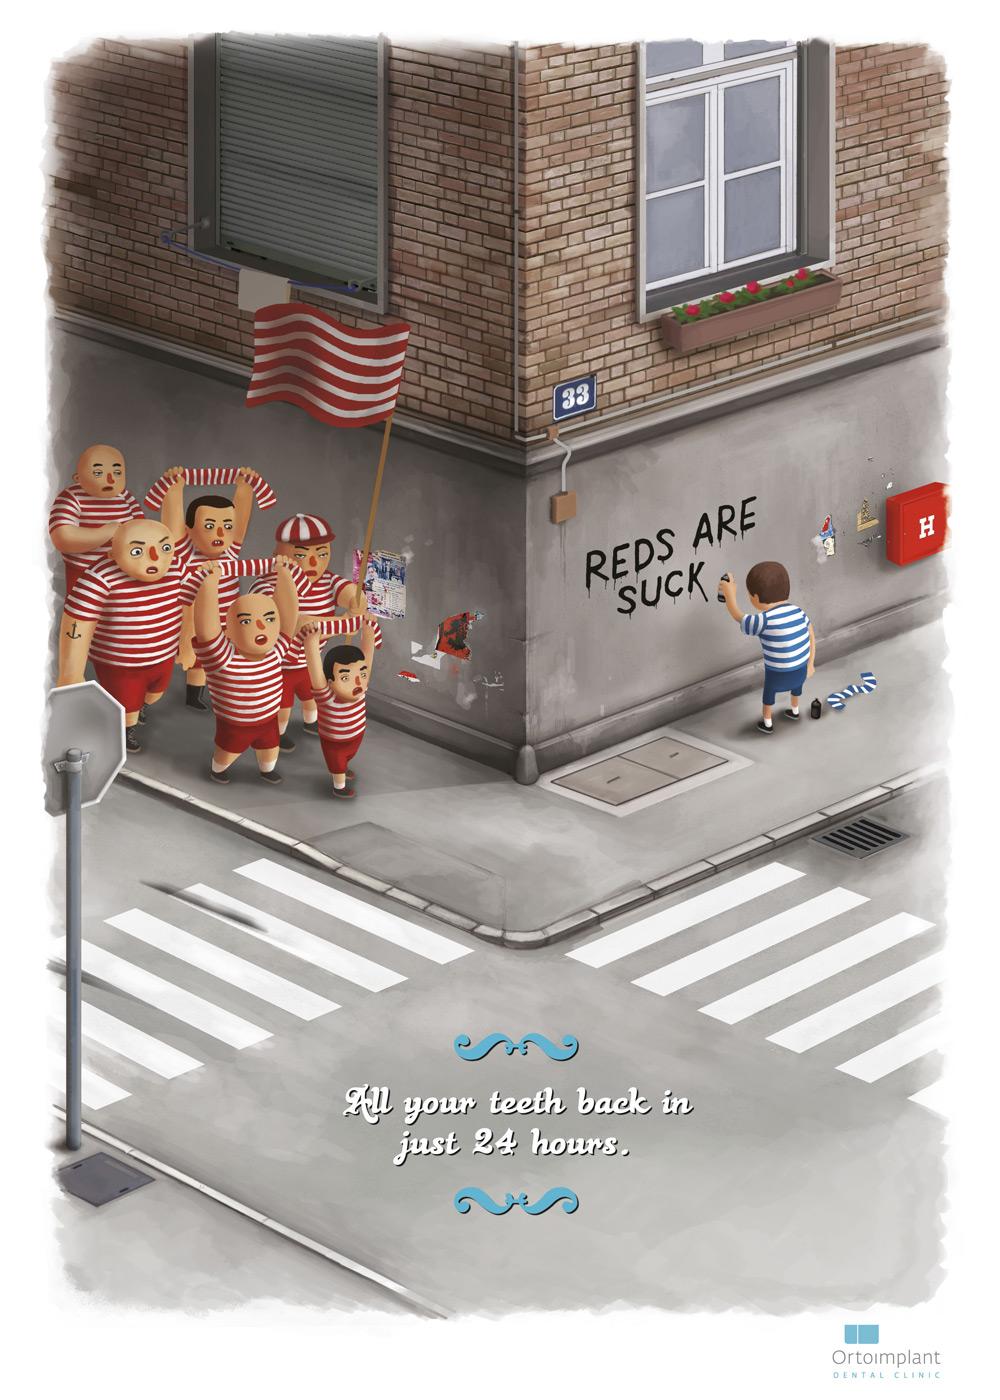 Funny-Print-Ads-38